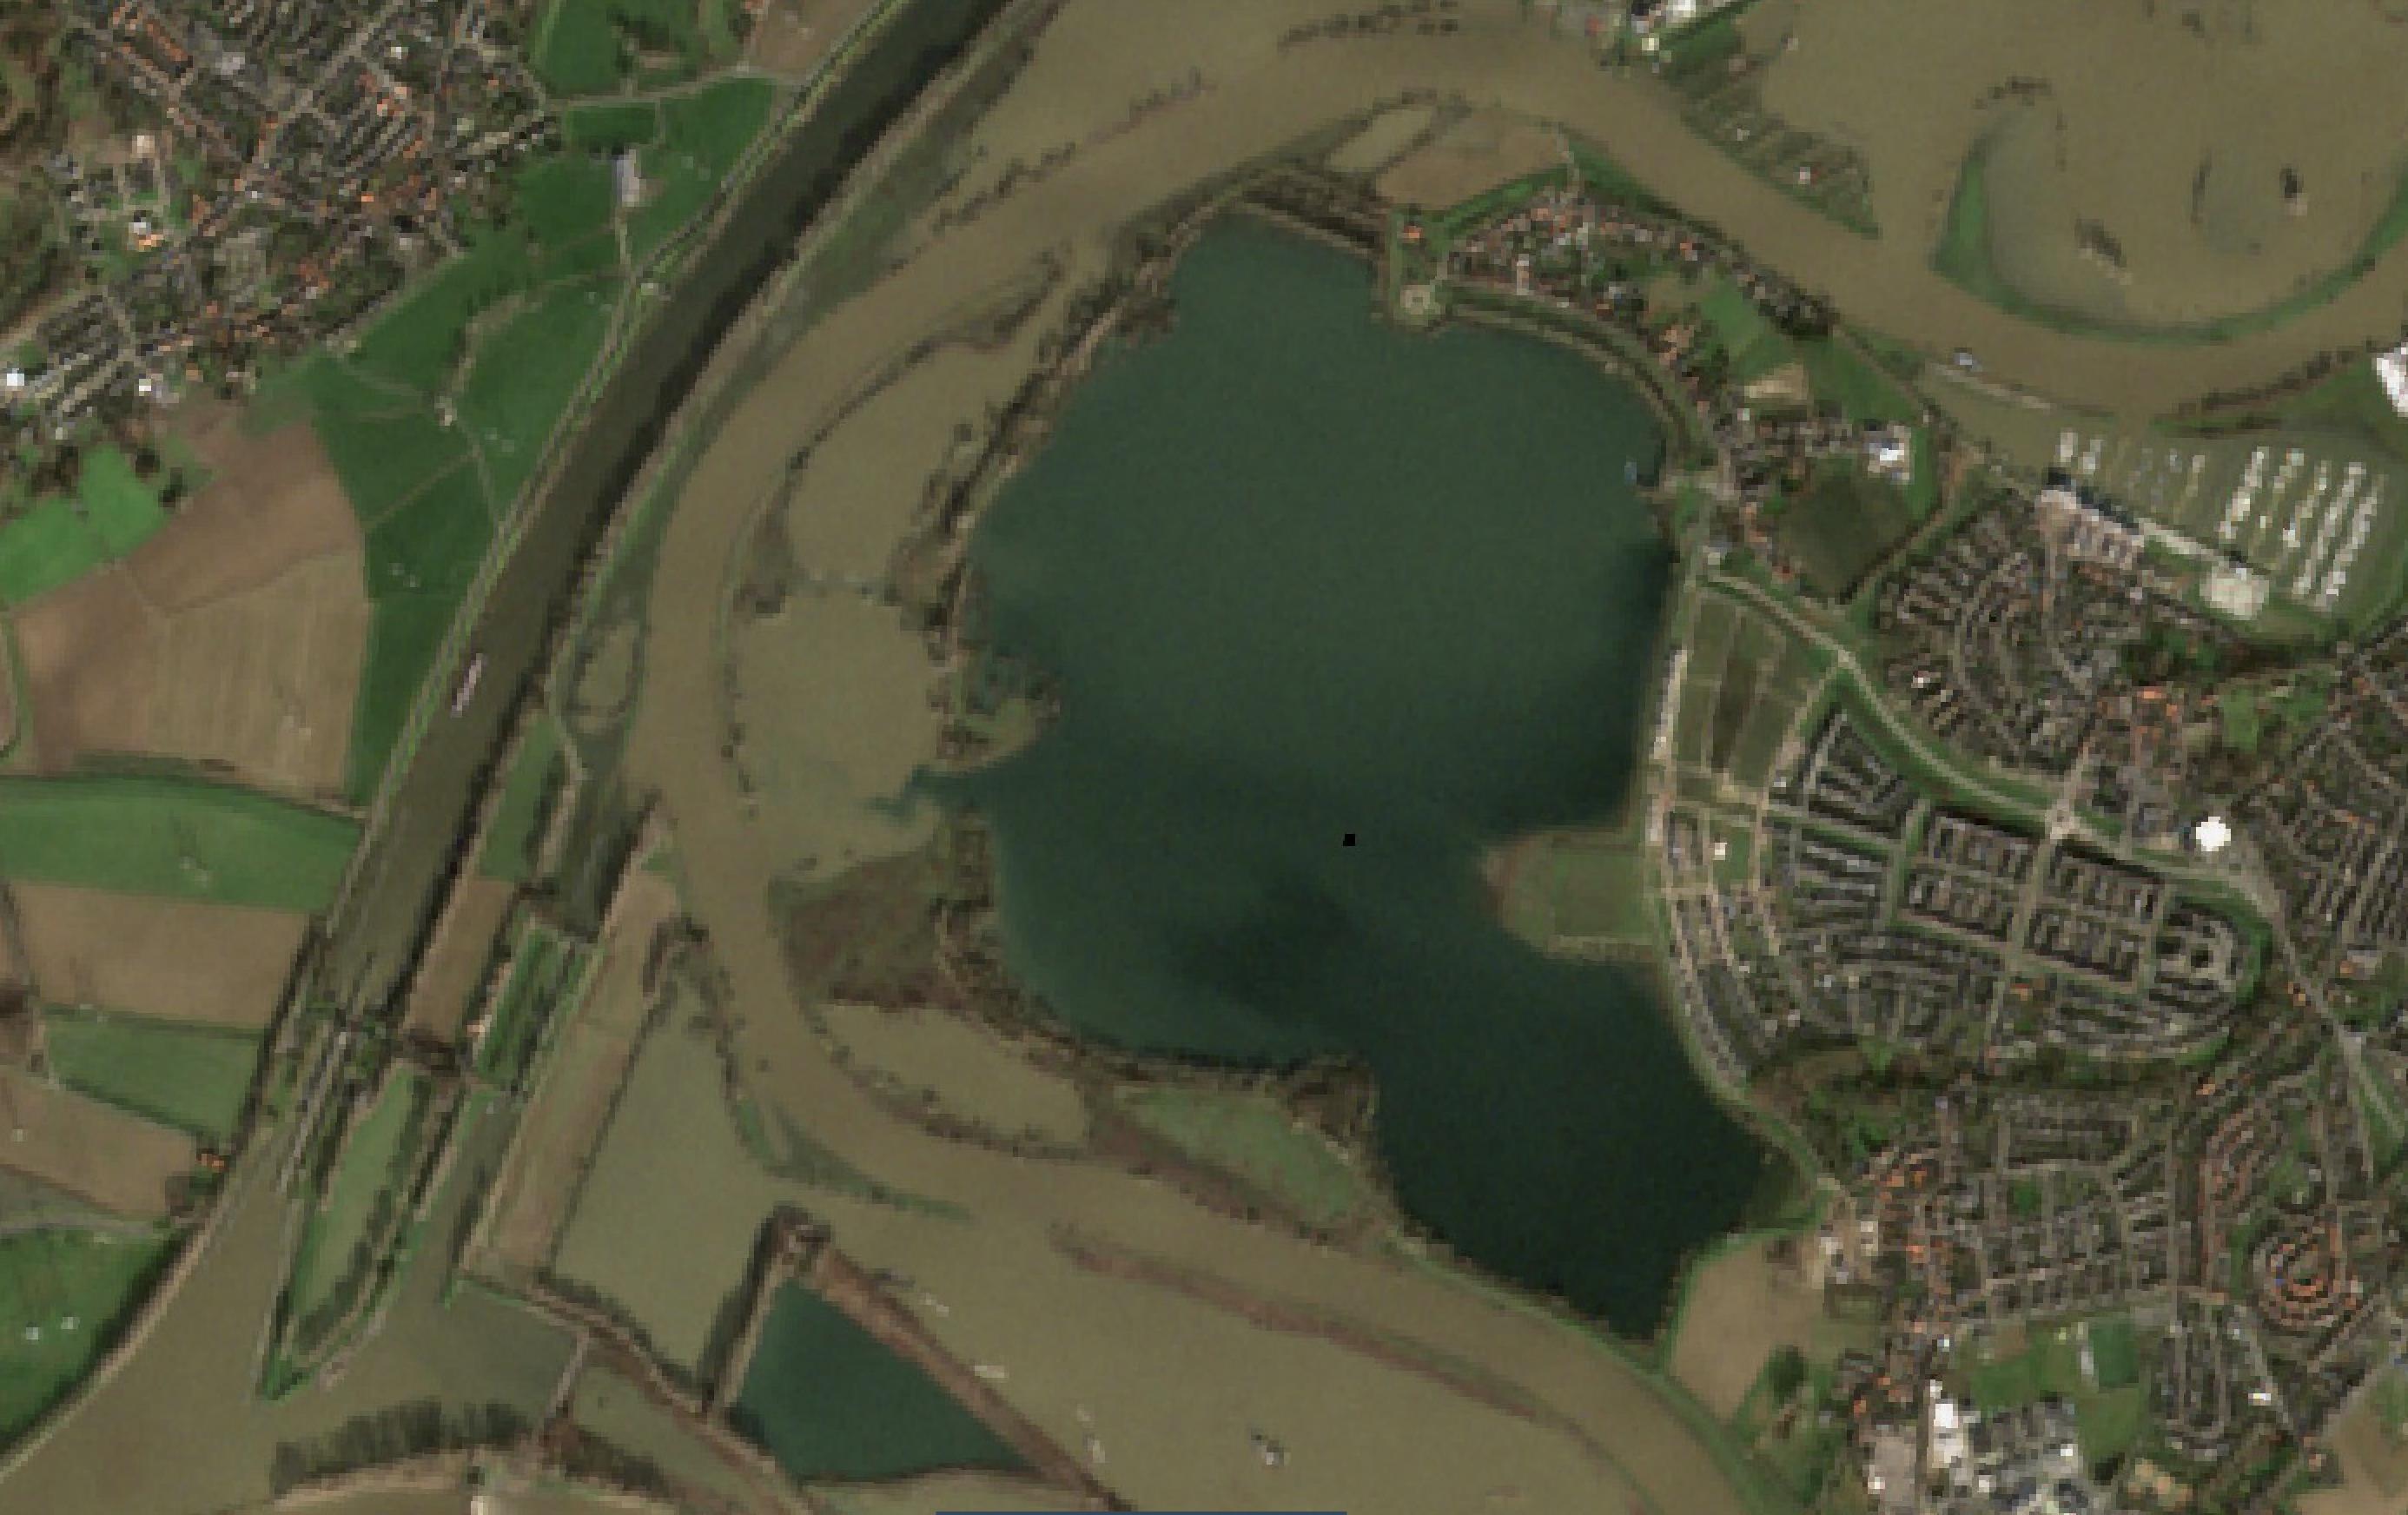 Satellietfoto van het Maasplassengebied nabij Ool